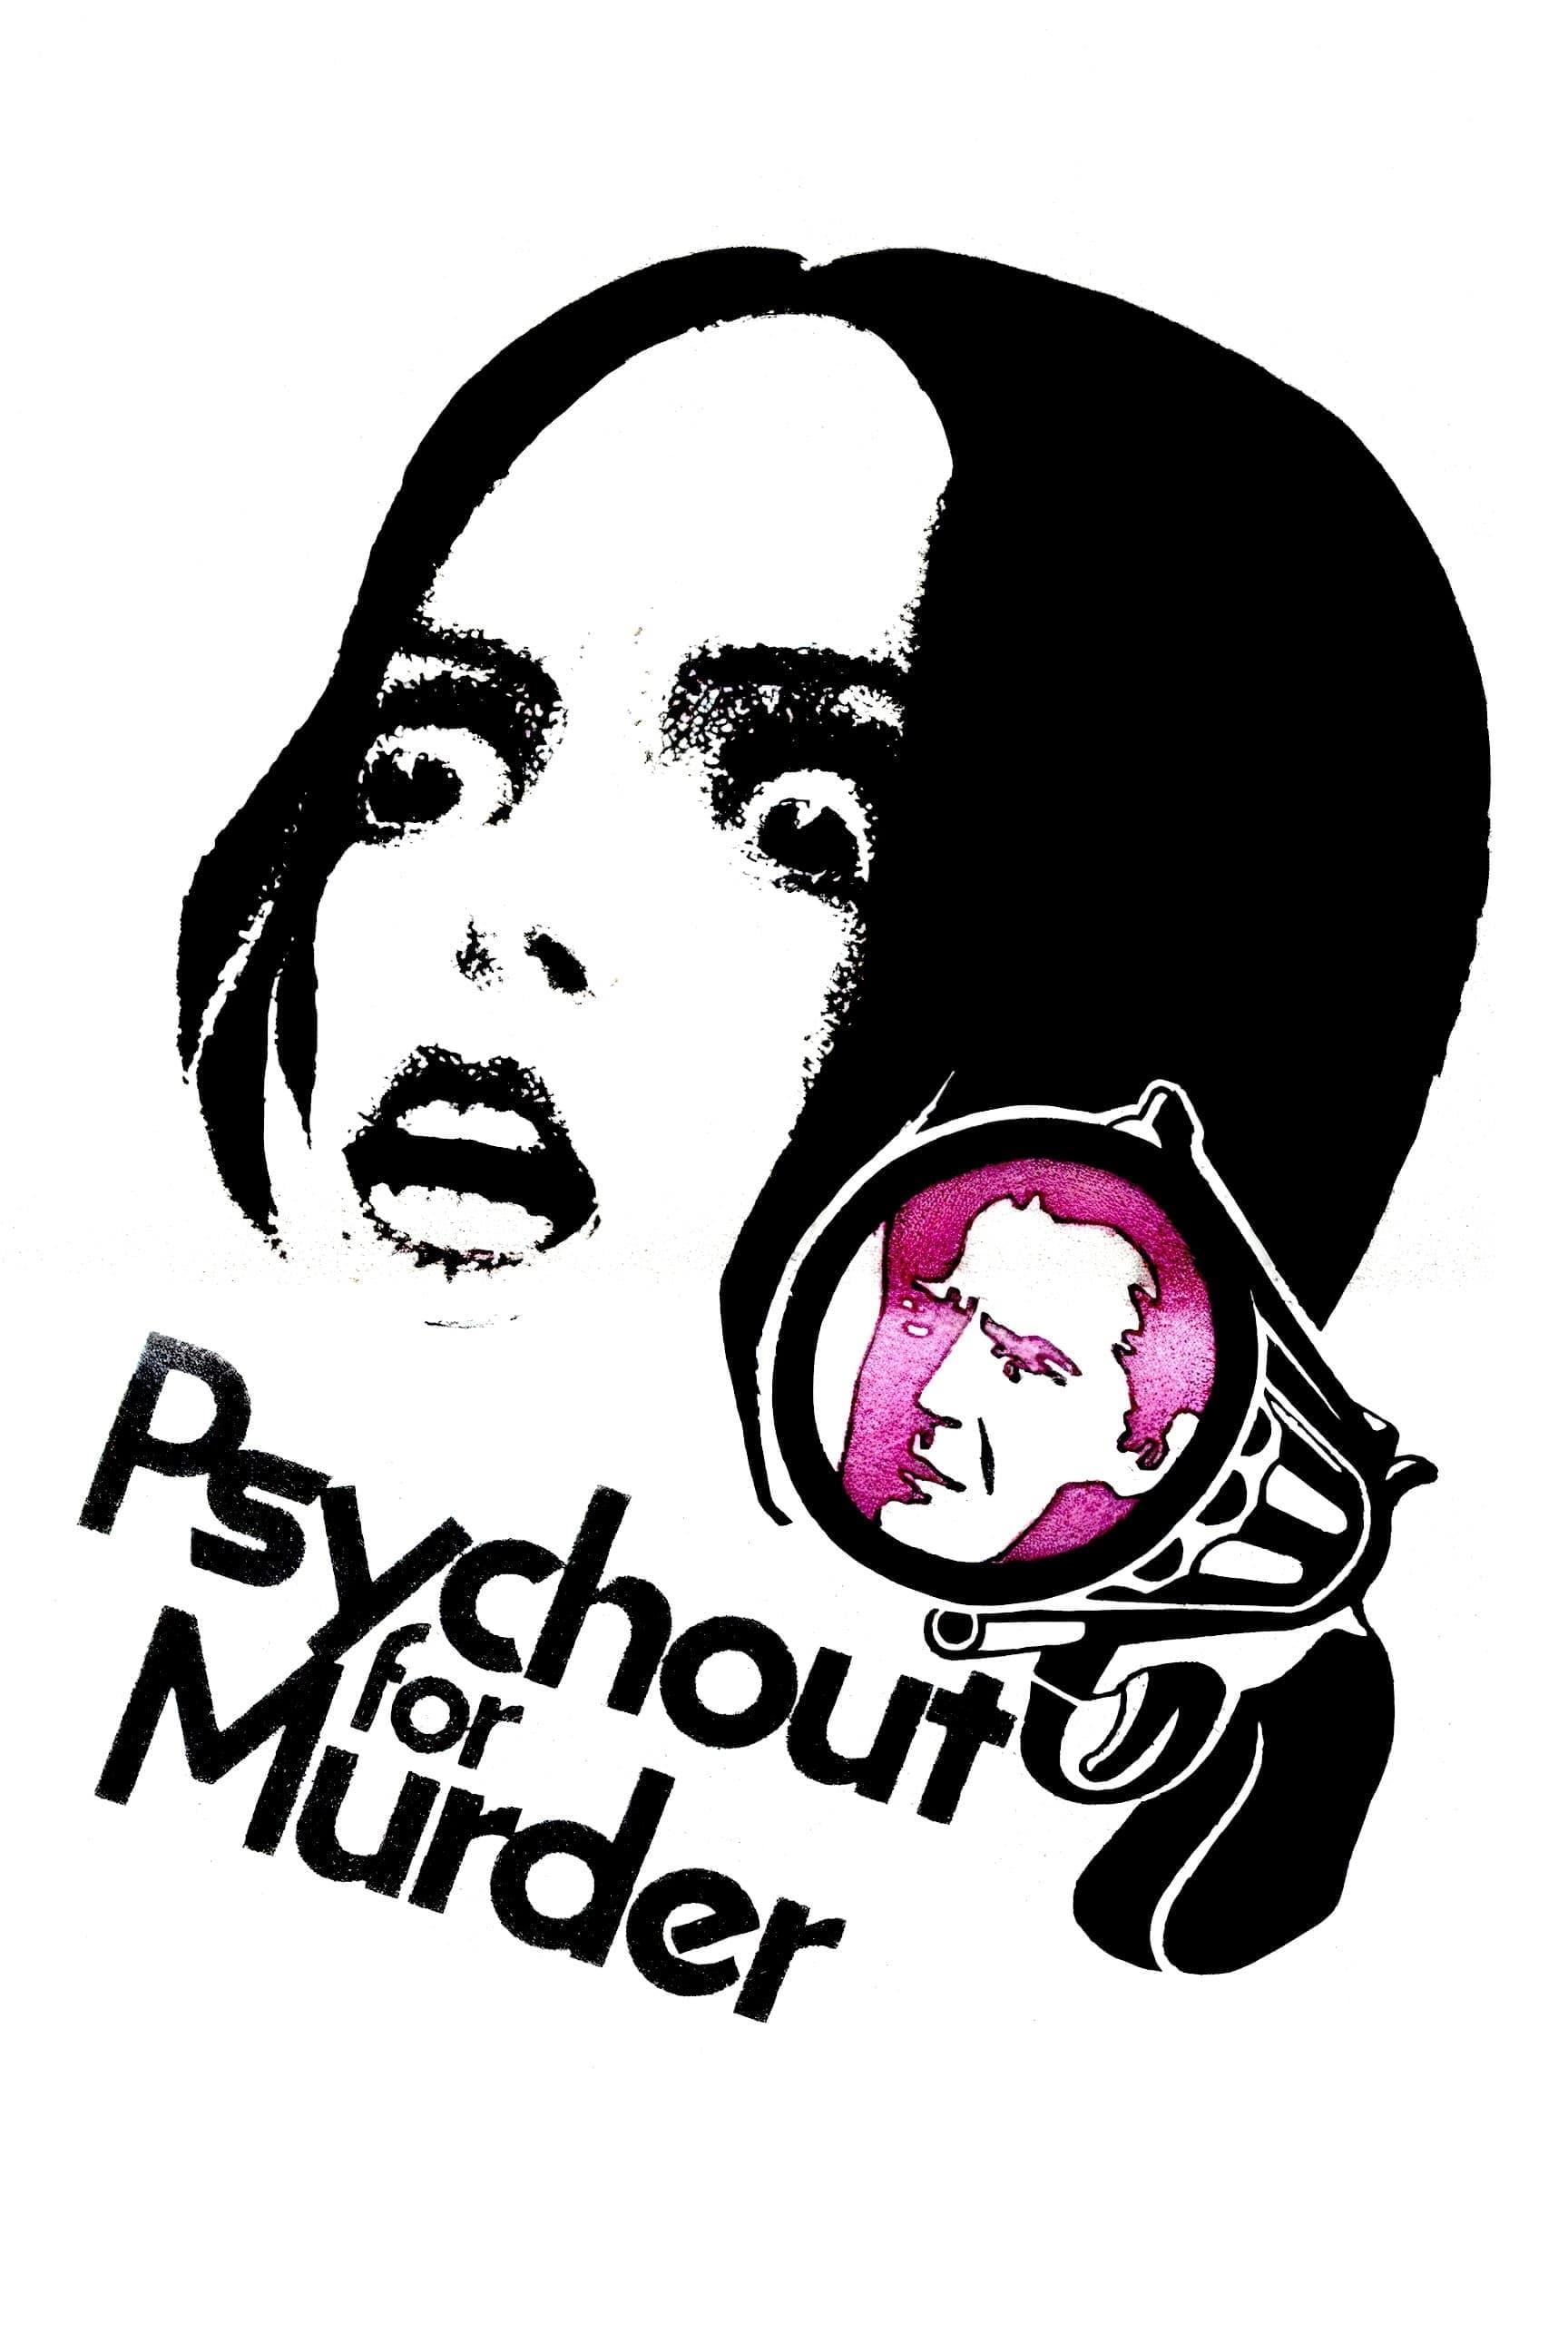 Psychout for Murder